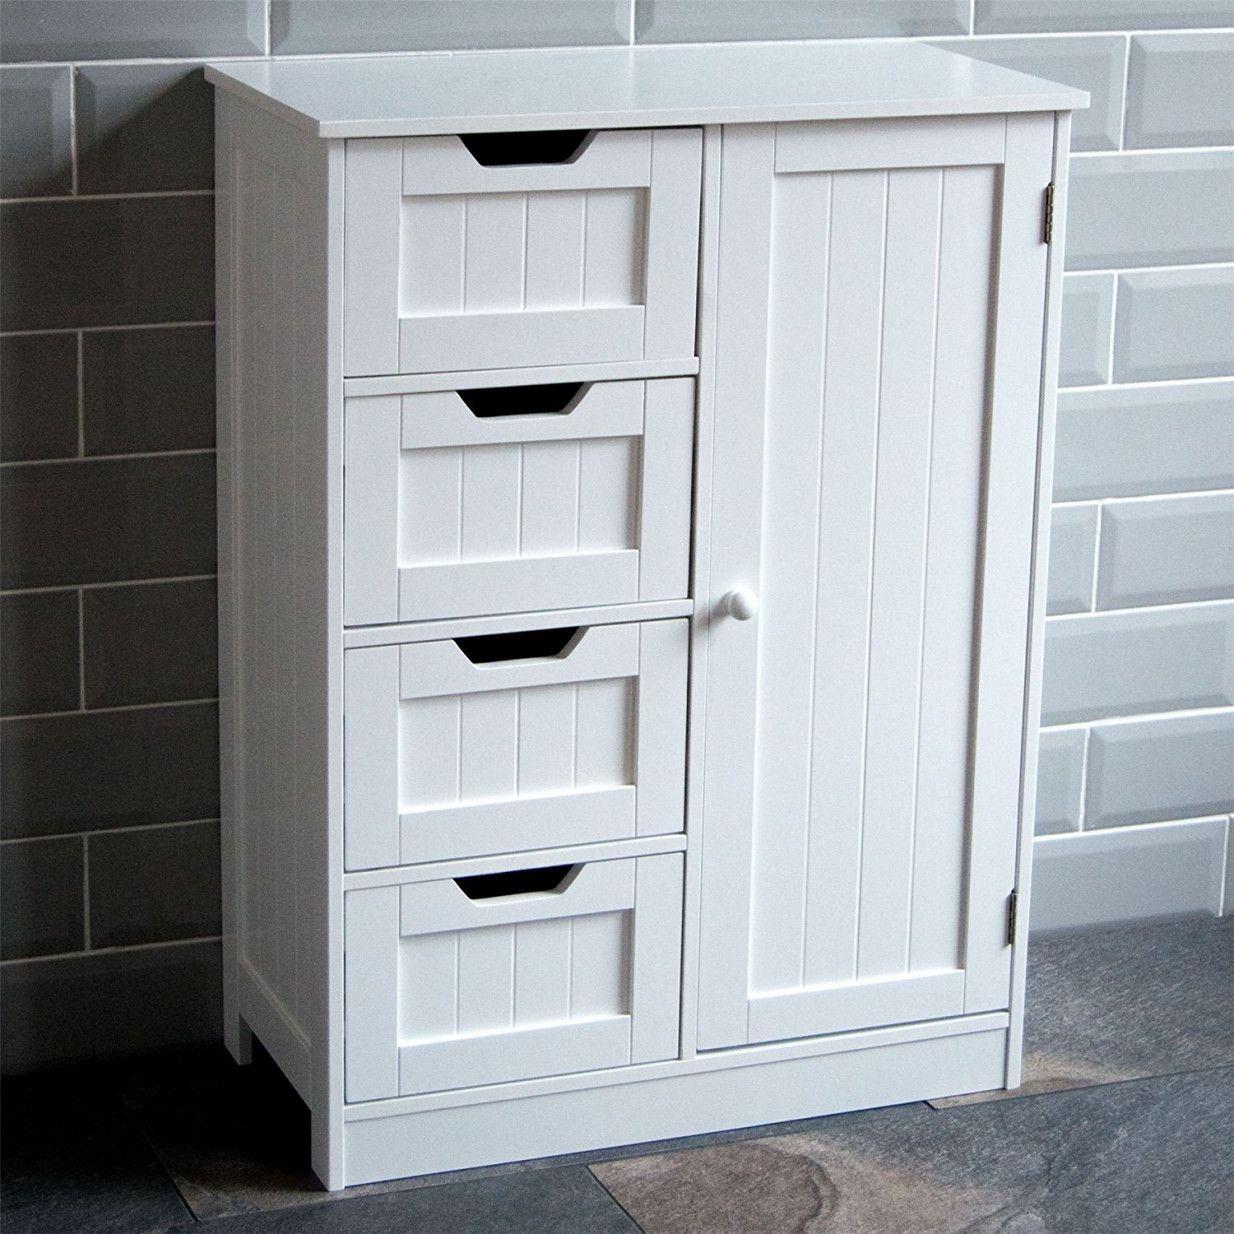 20 White Freestanding Bathroom Cabinet Favorite Interior Paint Colors Freestanding Bathroom Furniture Bathroom Standing Cabinet Storage Cabinet With Drawers